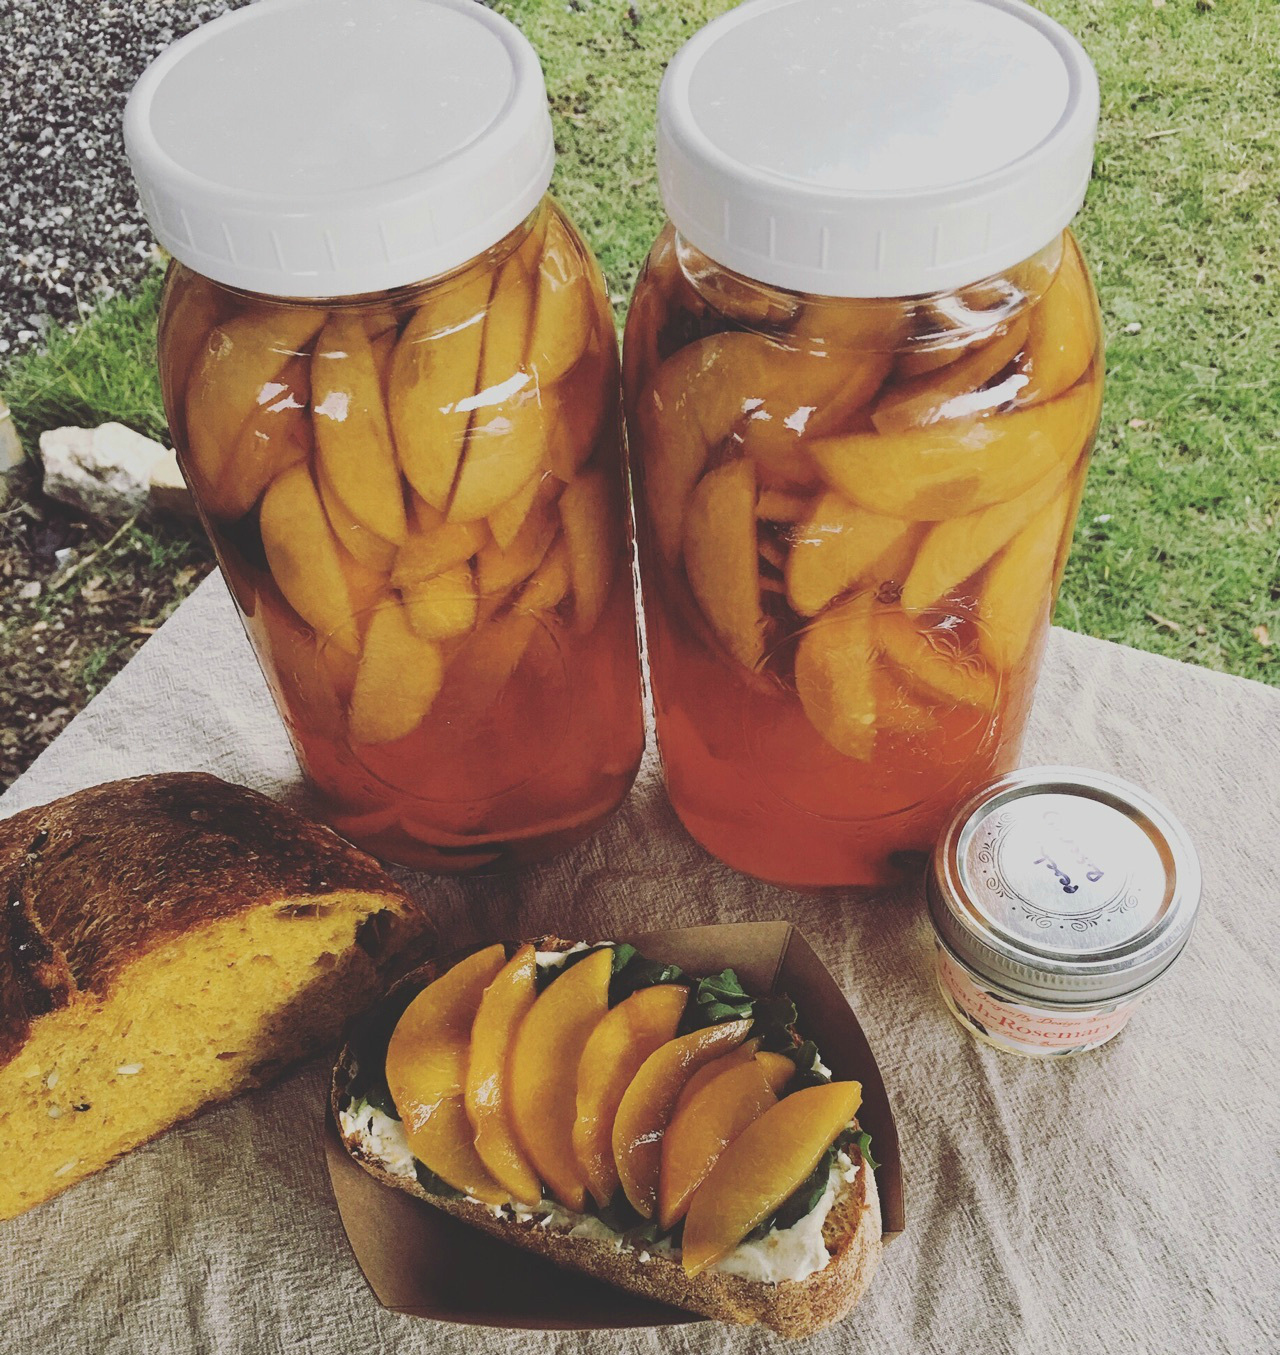 2016-07-21 Chef Ladd Pickled Peach Sliders EAV